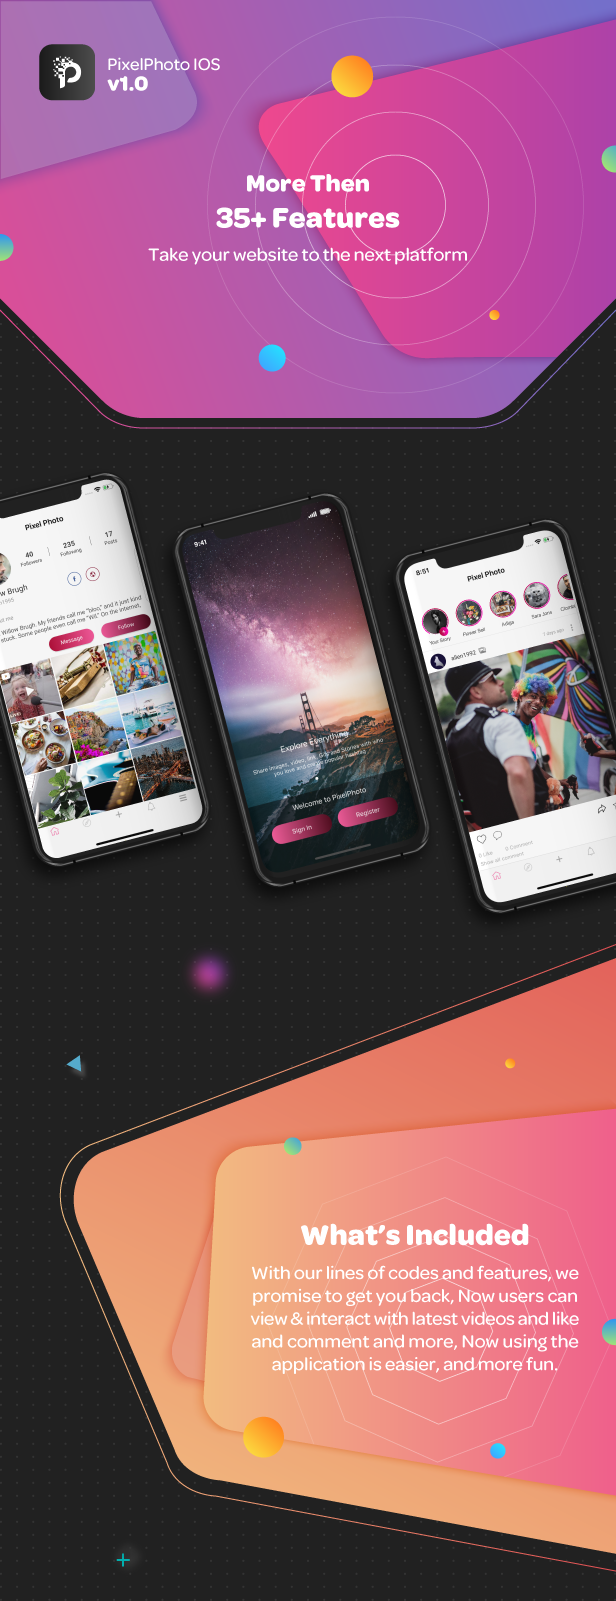 PixelPhoto IOS - Mobile Image Sharing & Photo Social Network - 3